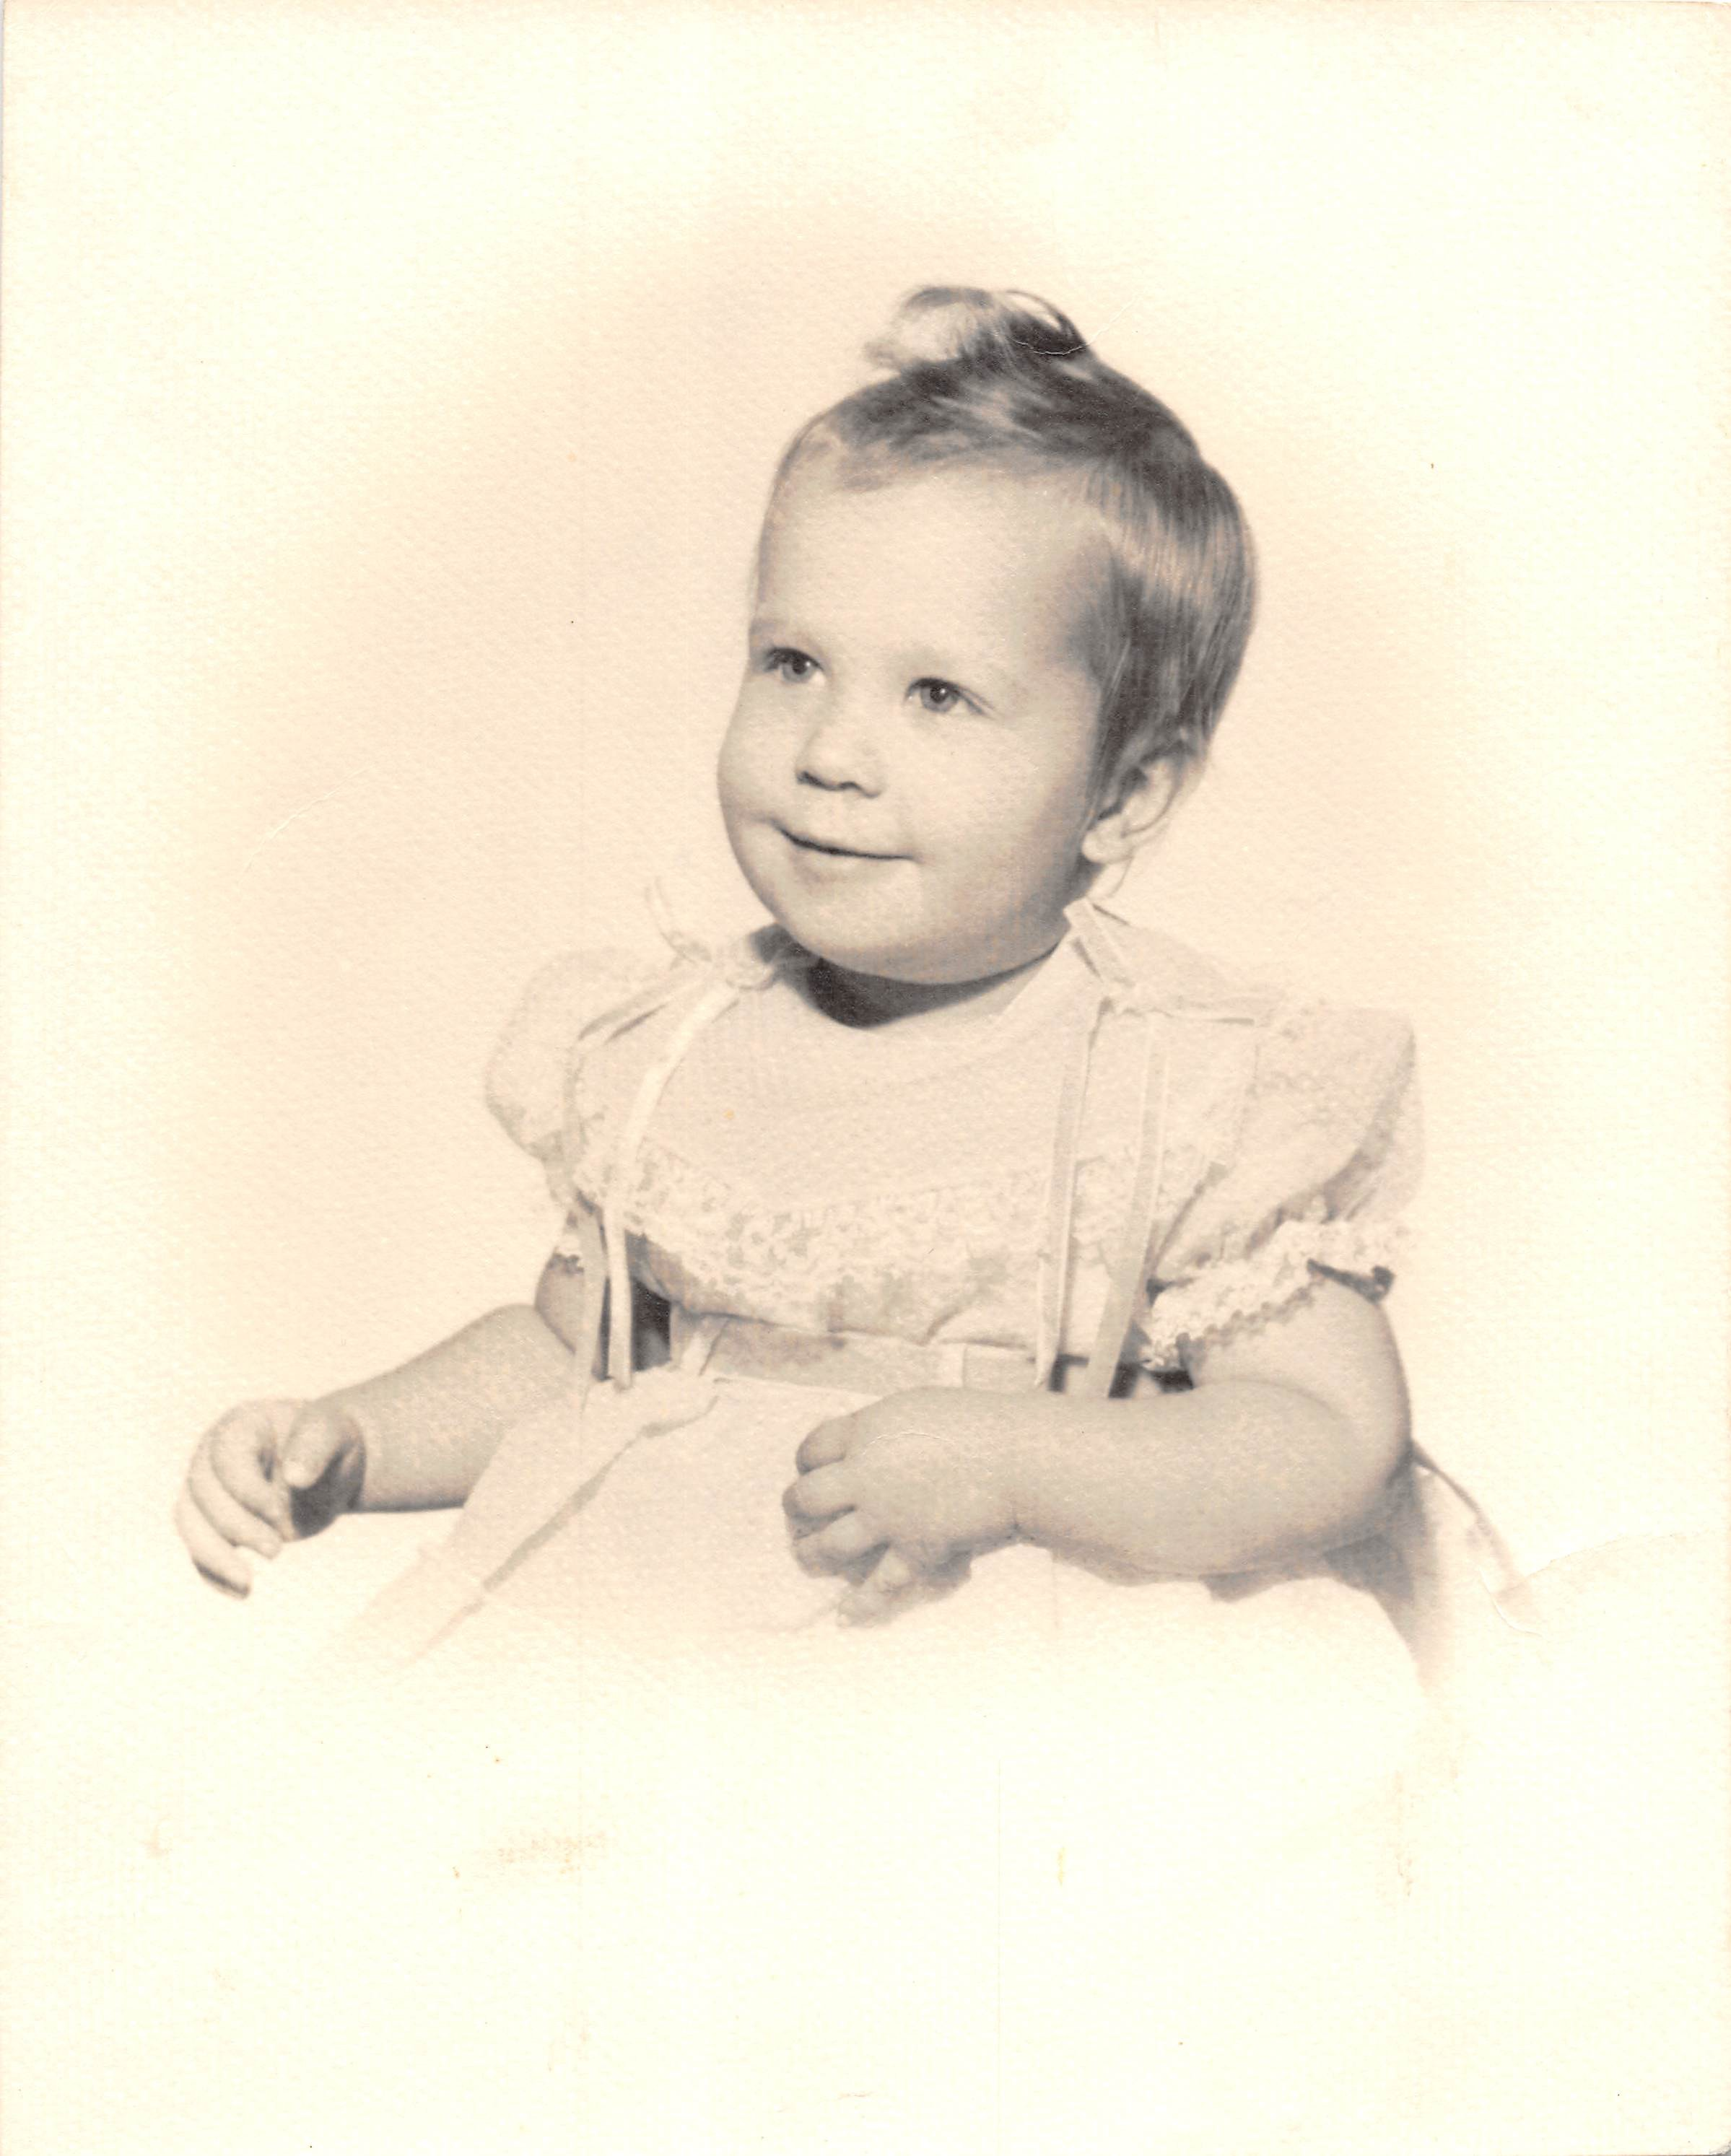 Obituary for Frances Marie Smith (Photo album)